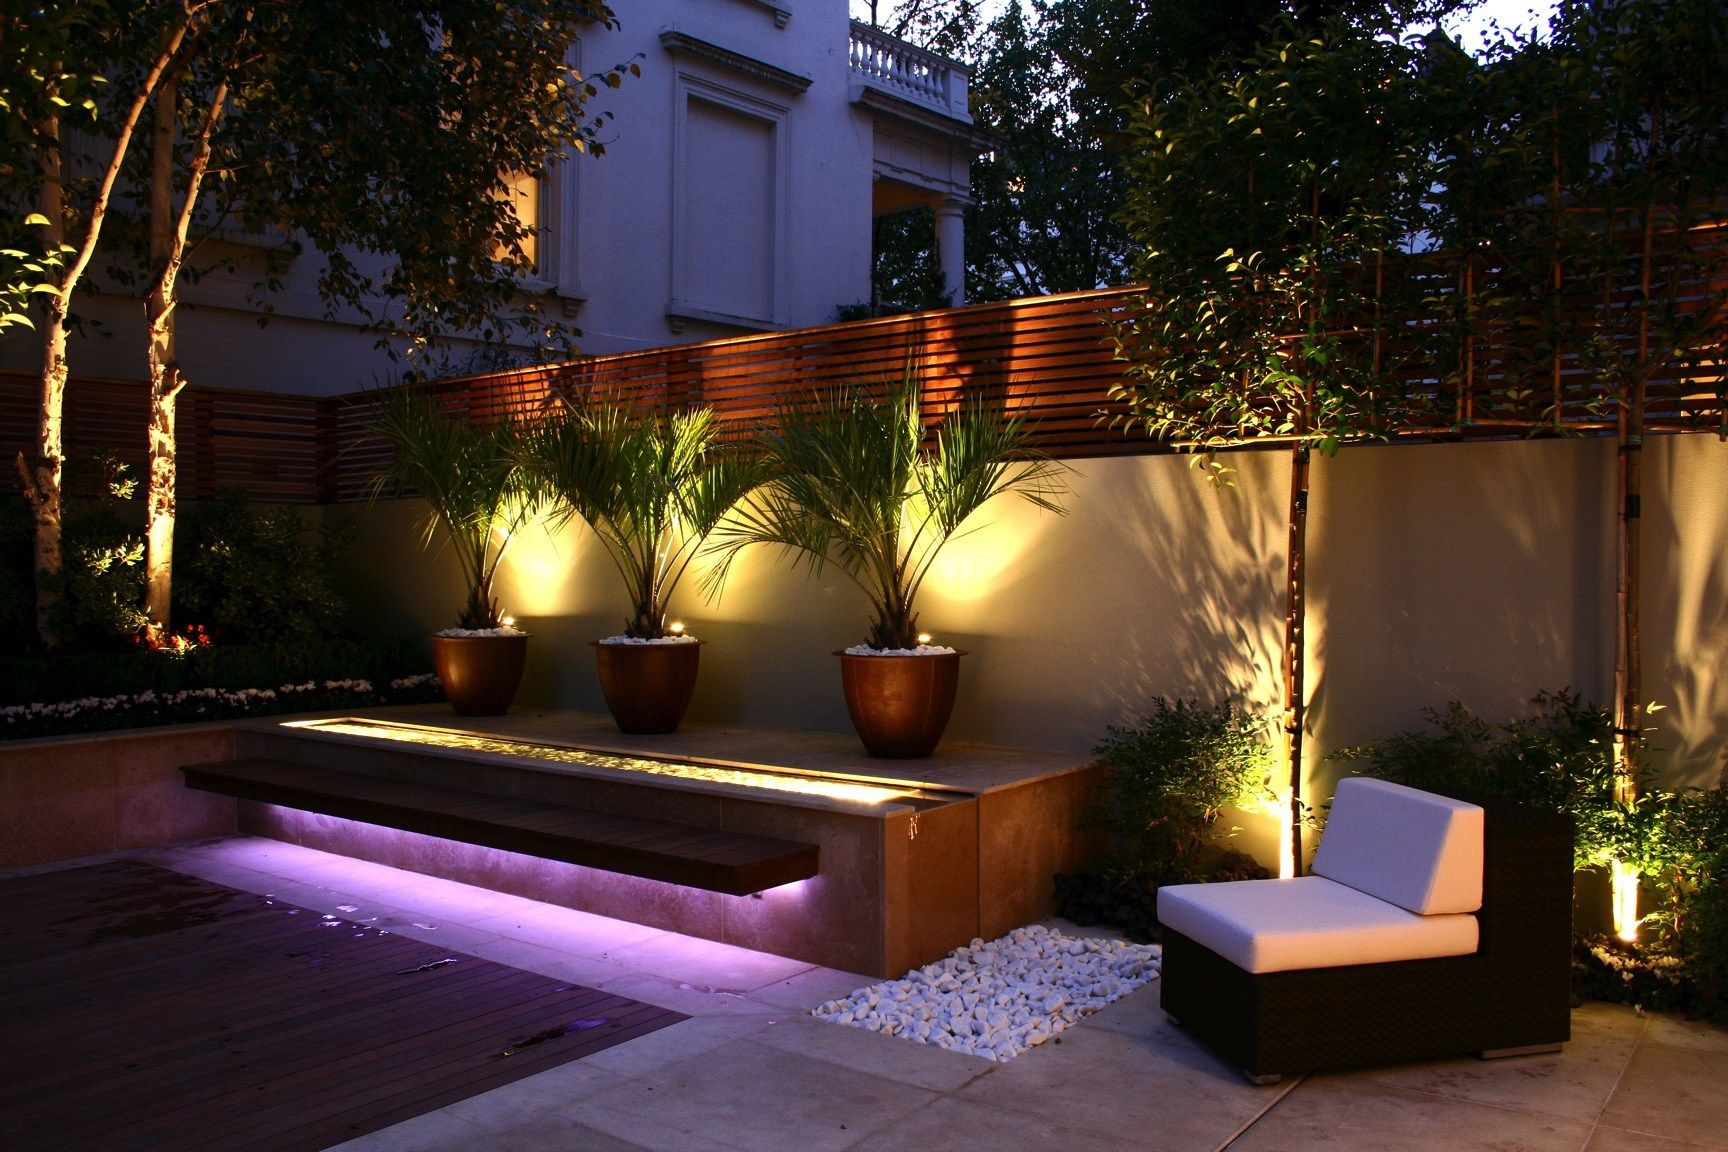 Little Venice - Kate Gould Gardens